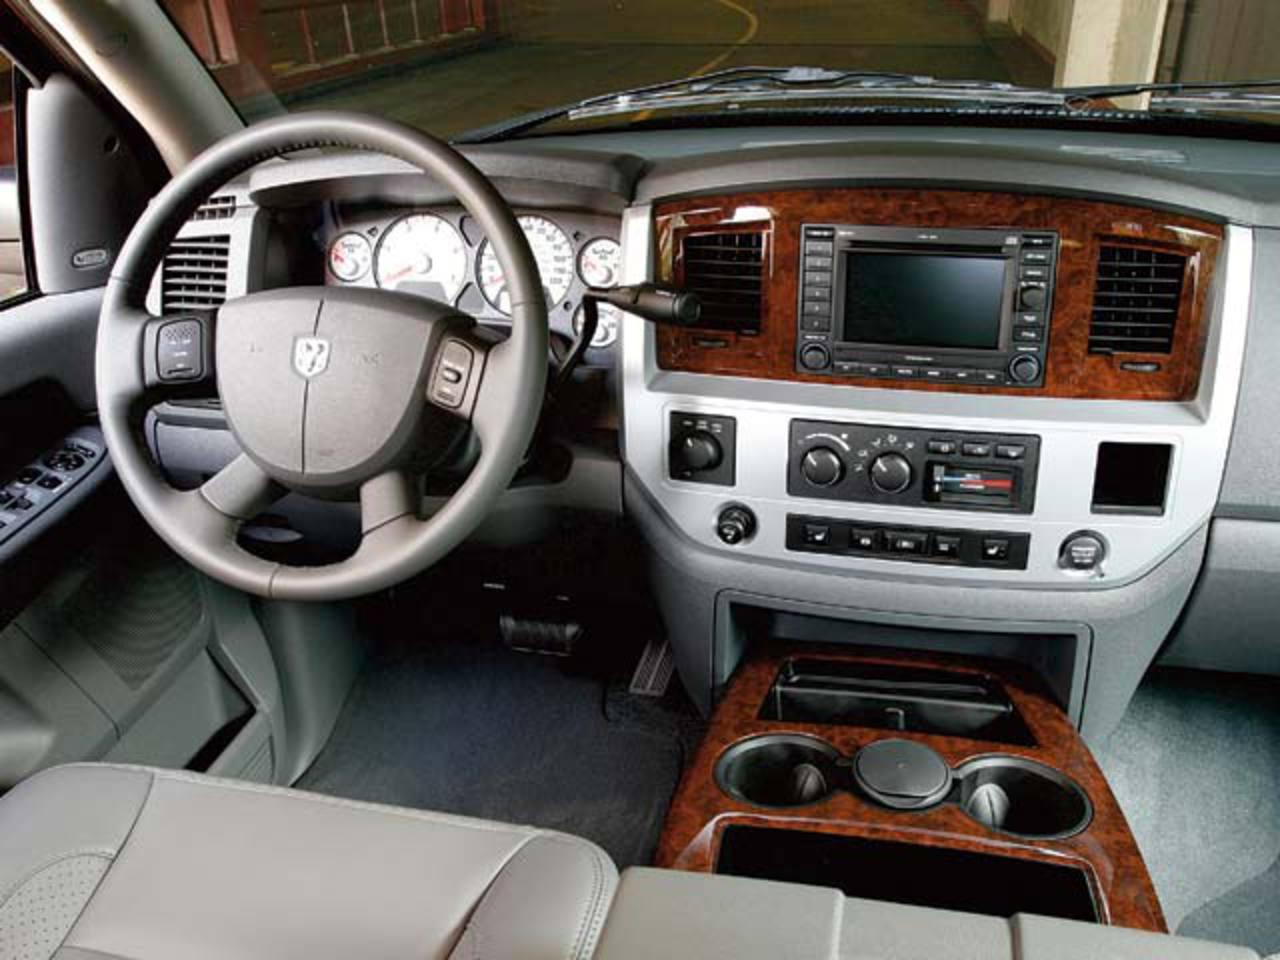 Topworldauto Photos Of Dodge Ram 2500 Laramie Photo Galleries Interior